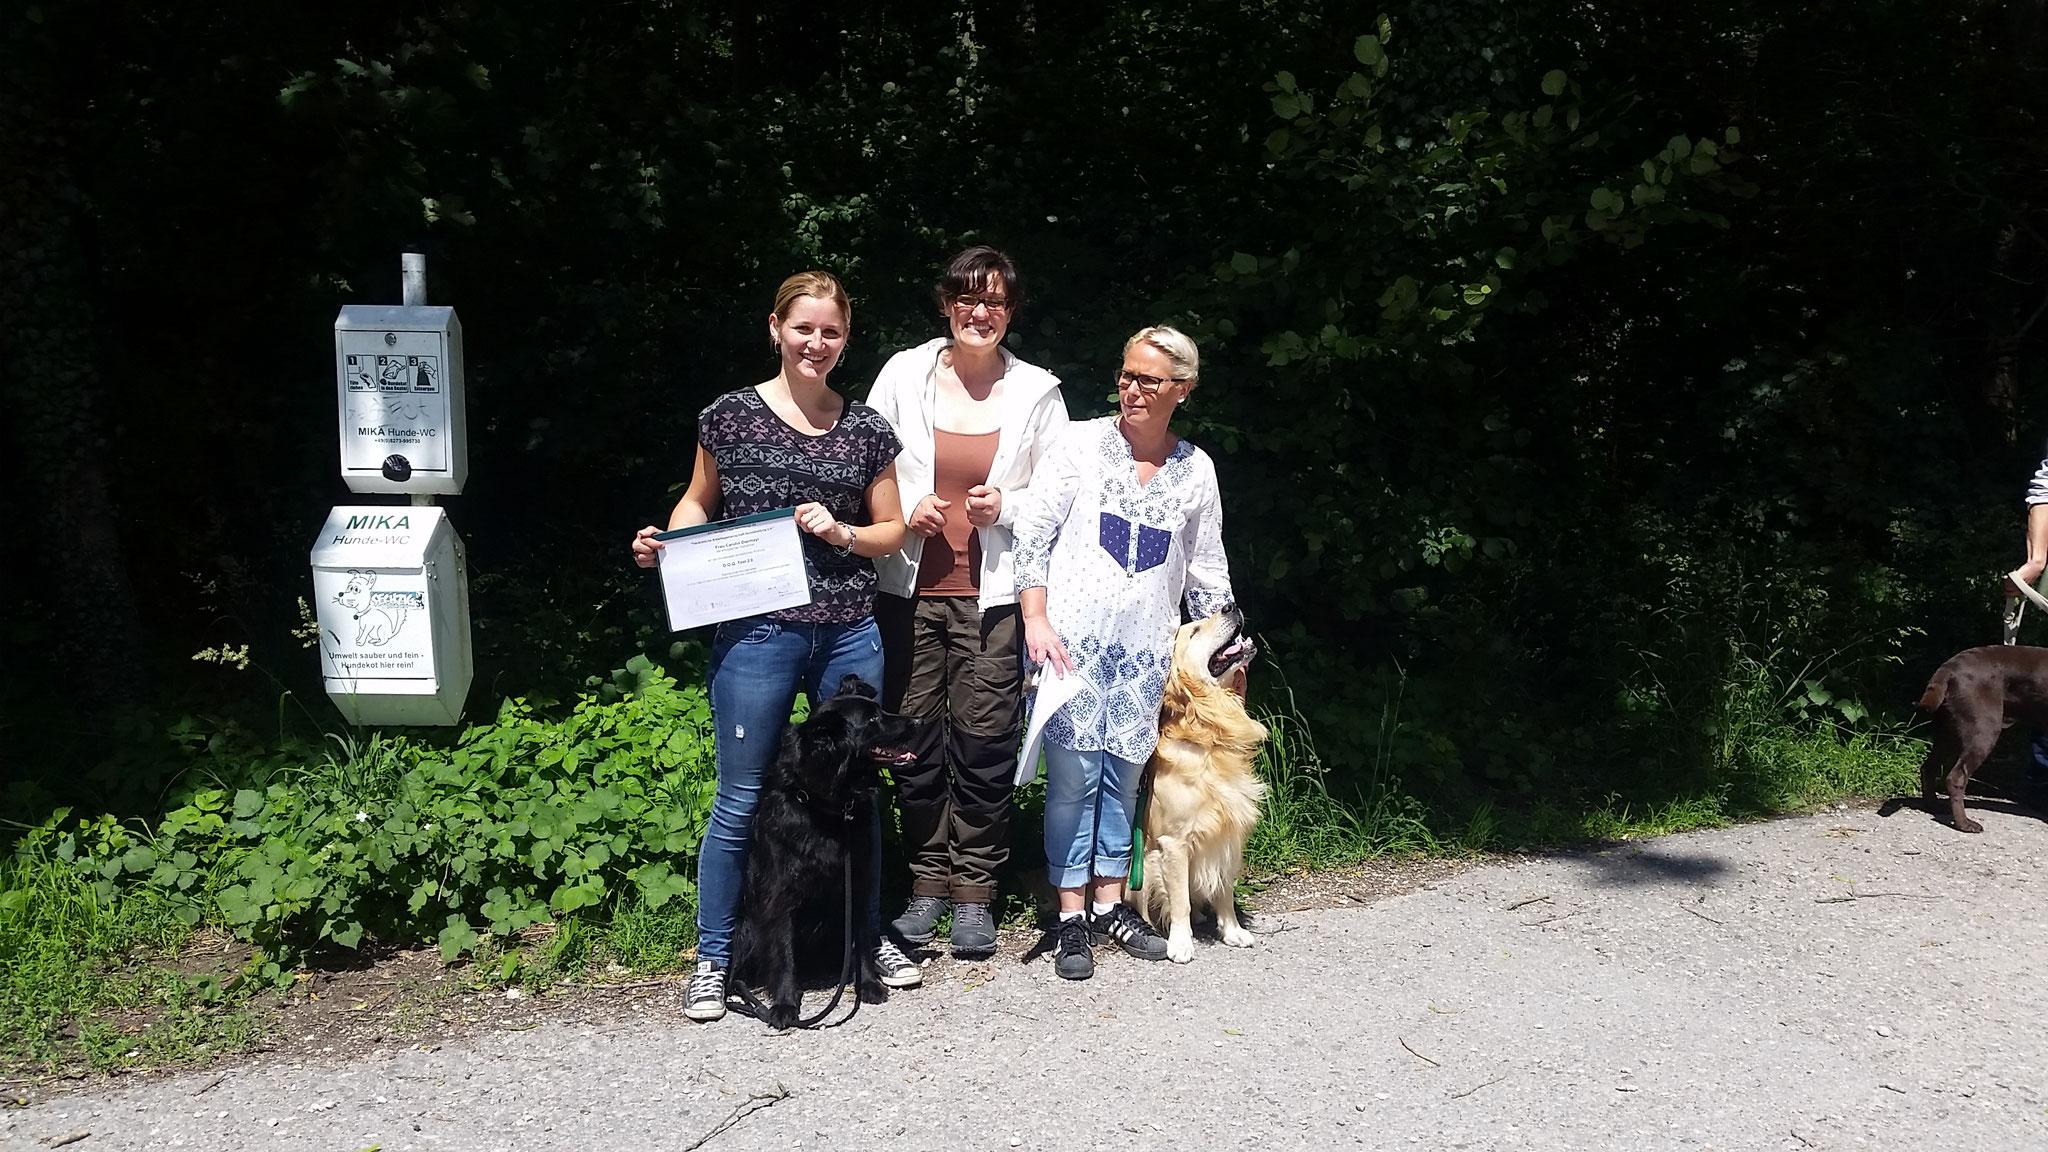 Carolin mit Bonny und Sonja mit Paul